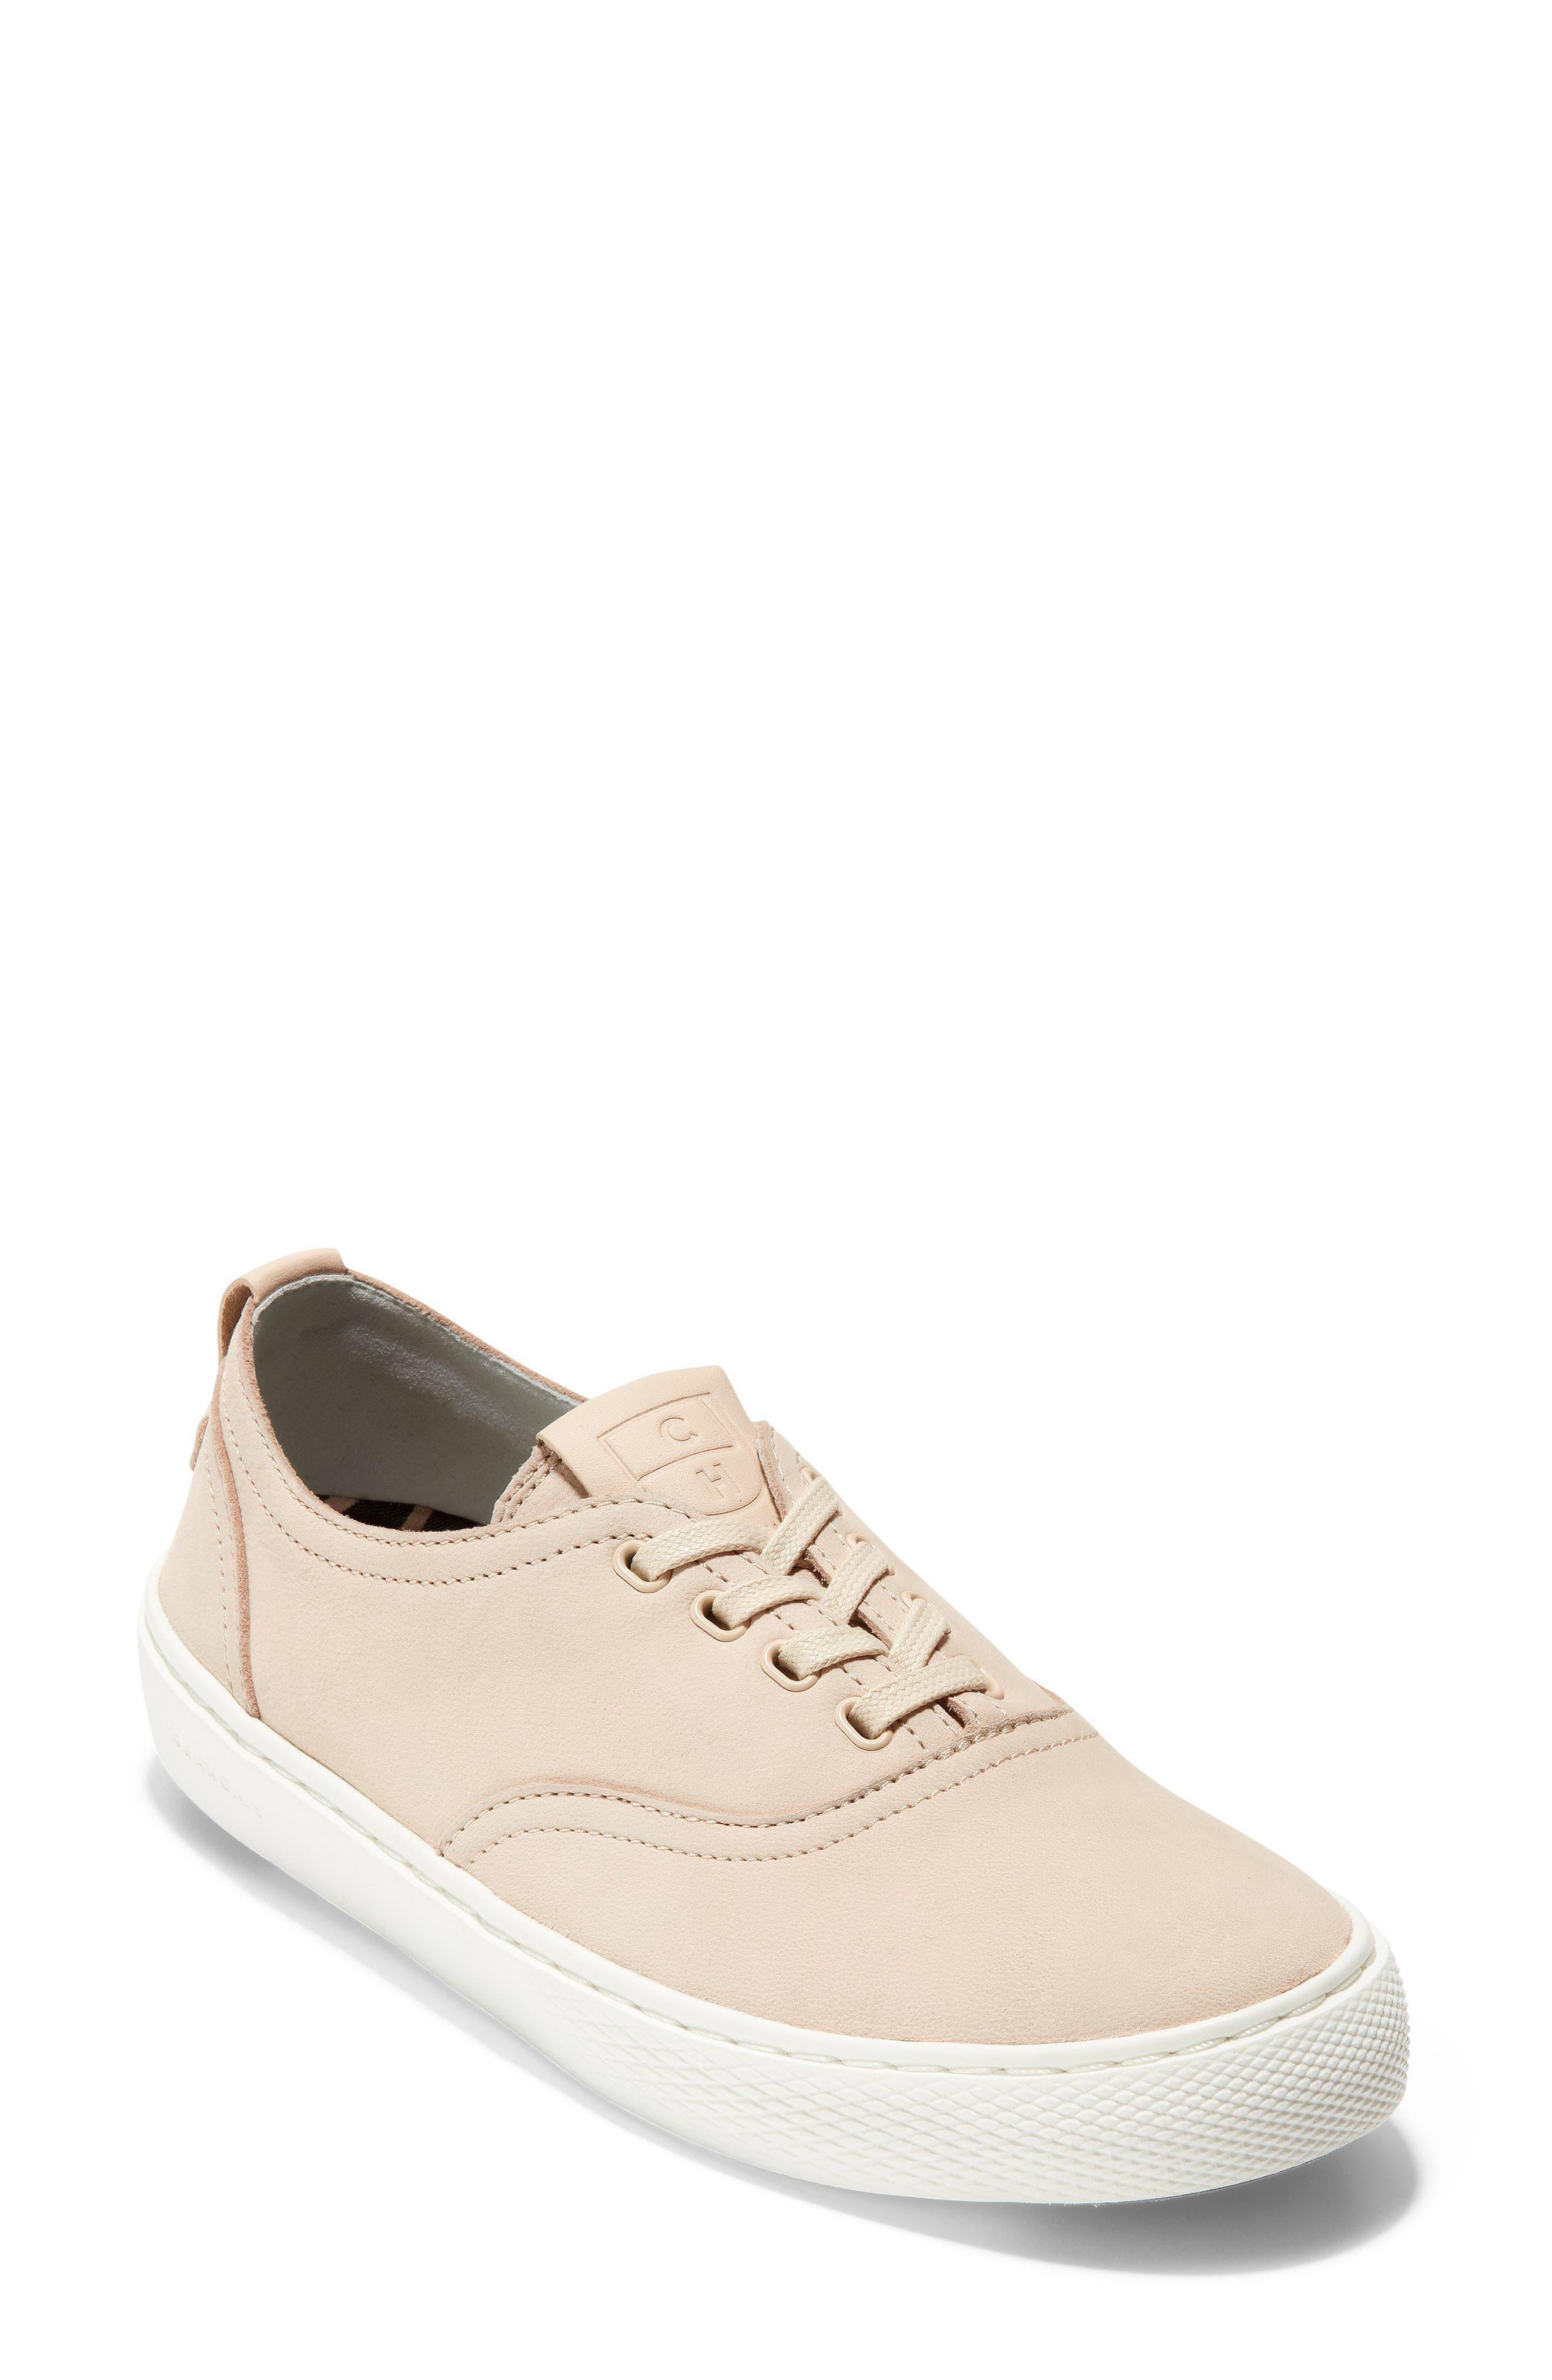 GrandPro Deck Sneaker,                         Main,                         color, 250